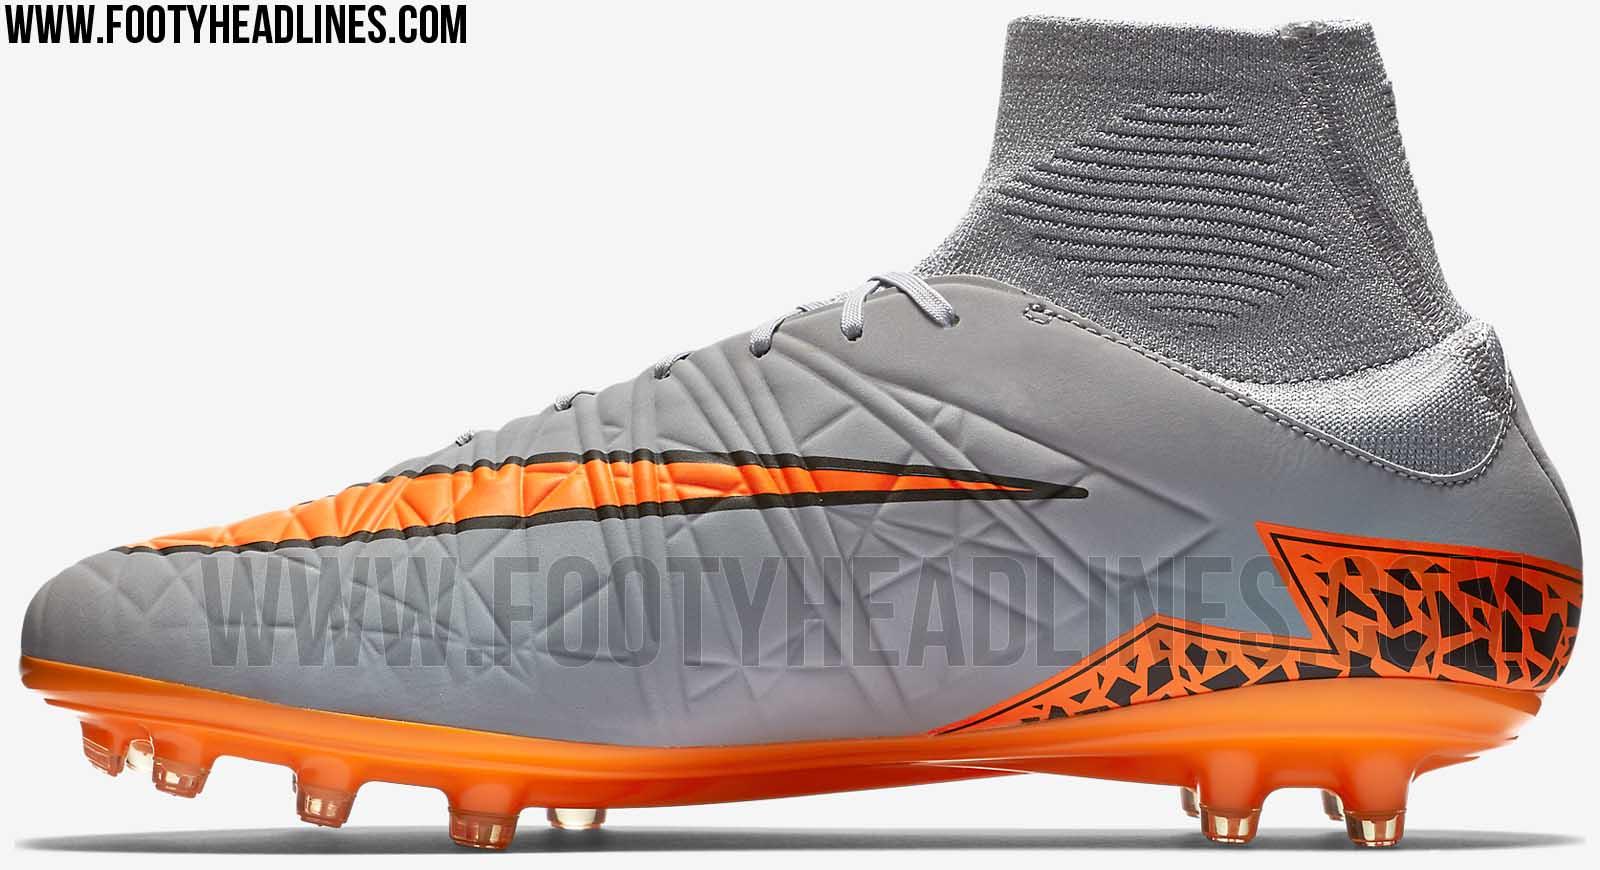 Nike Hypervenom Phatal 2 Dynamic Fit Collar Boots Released ...